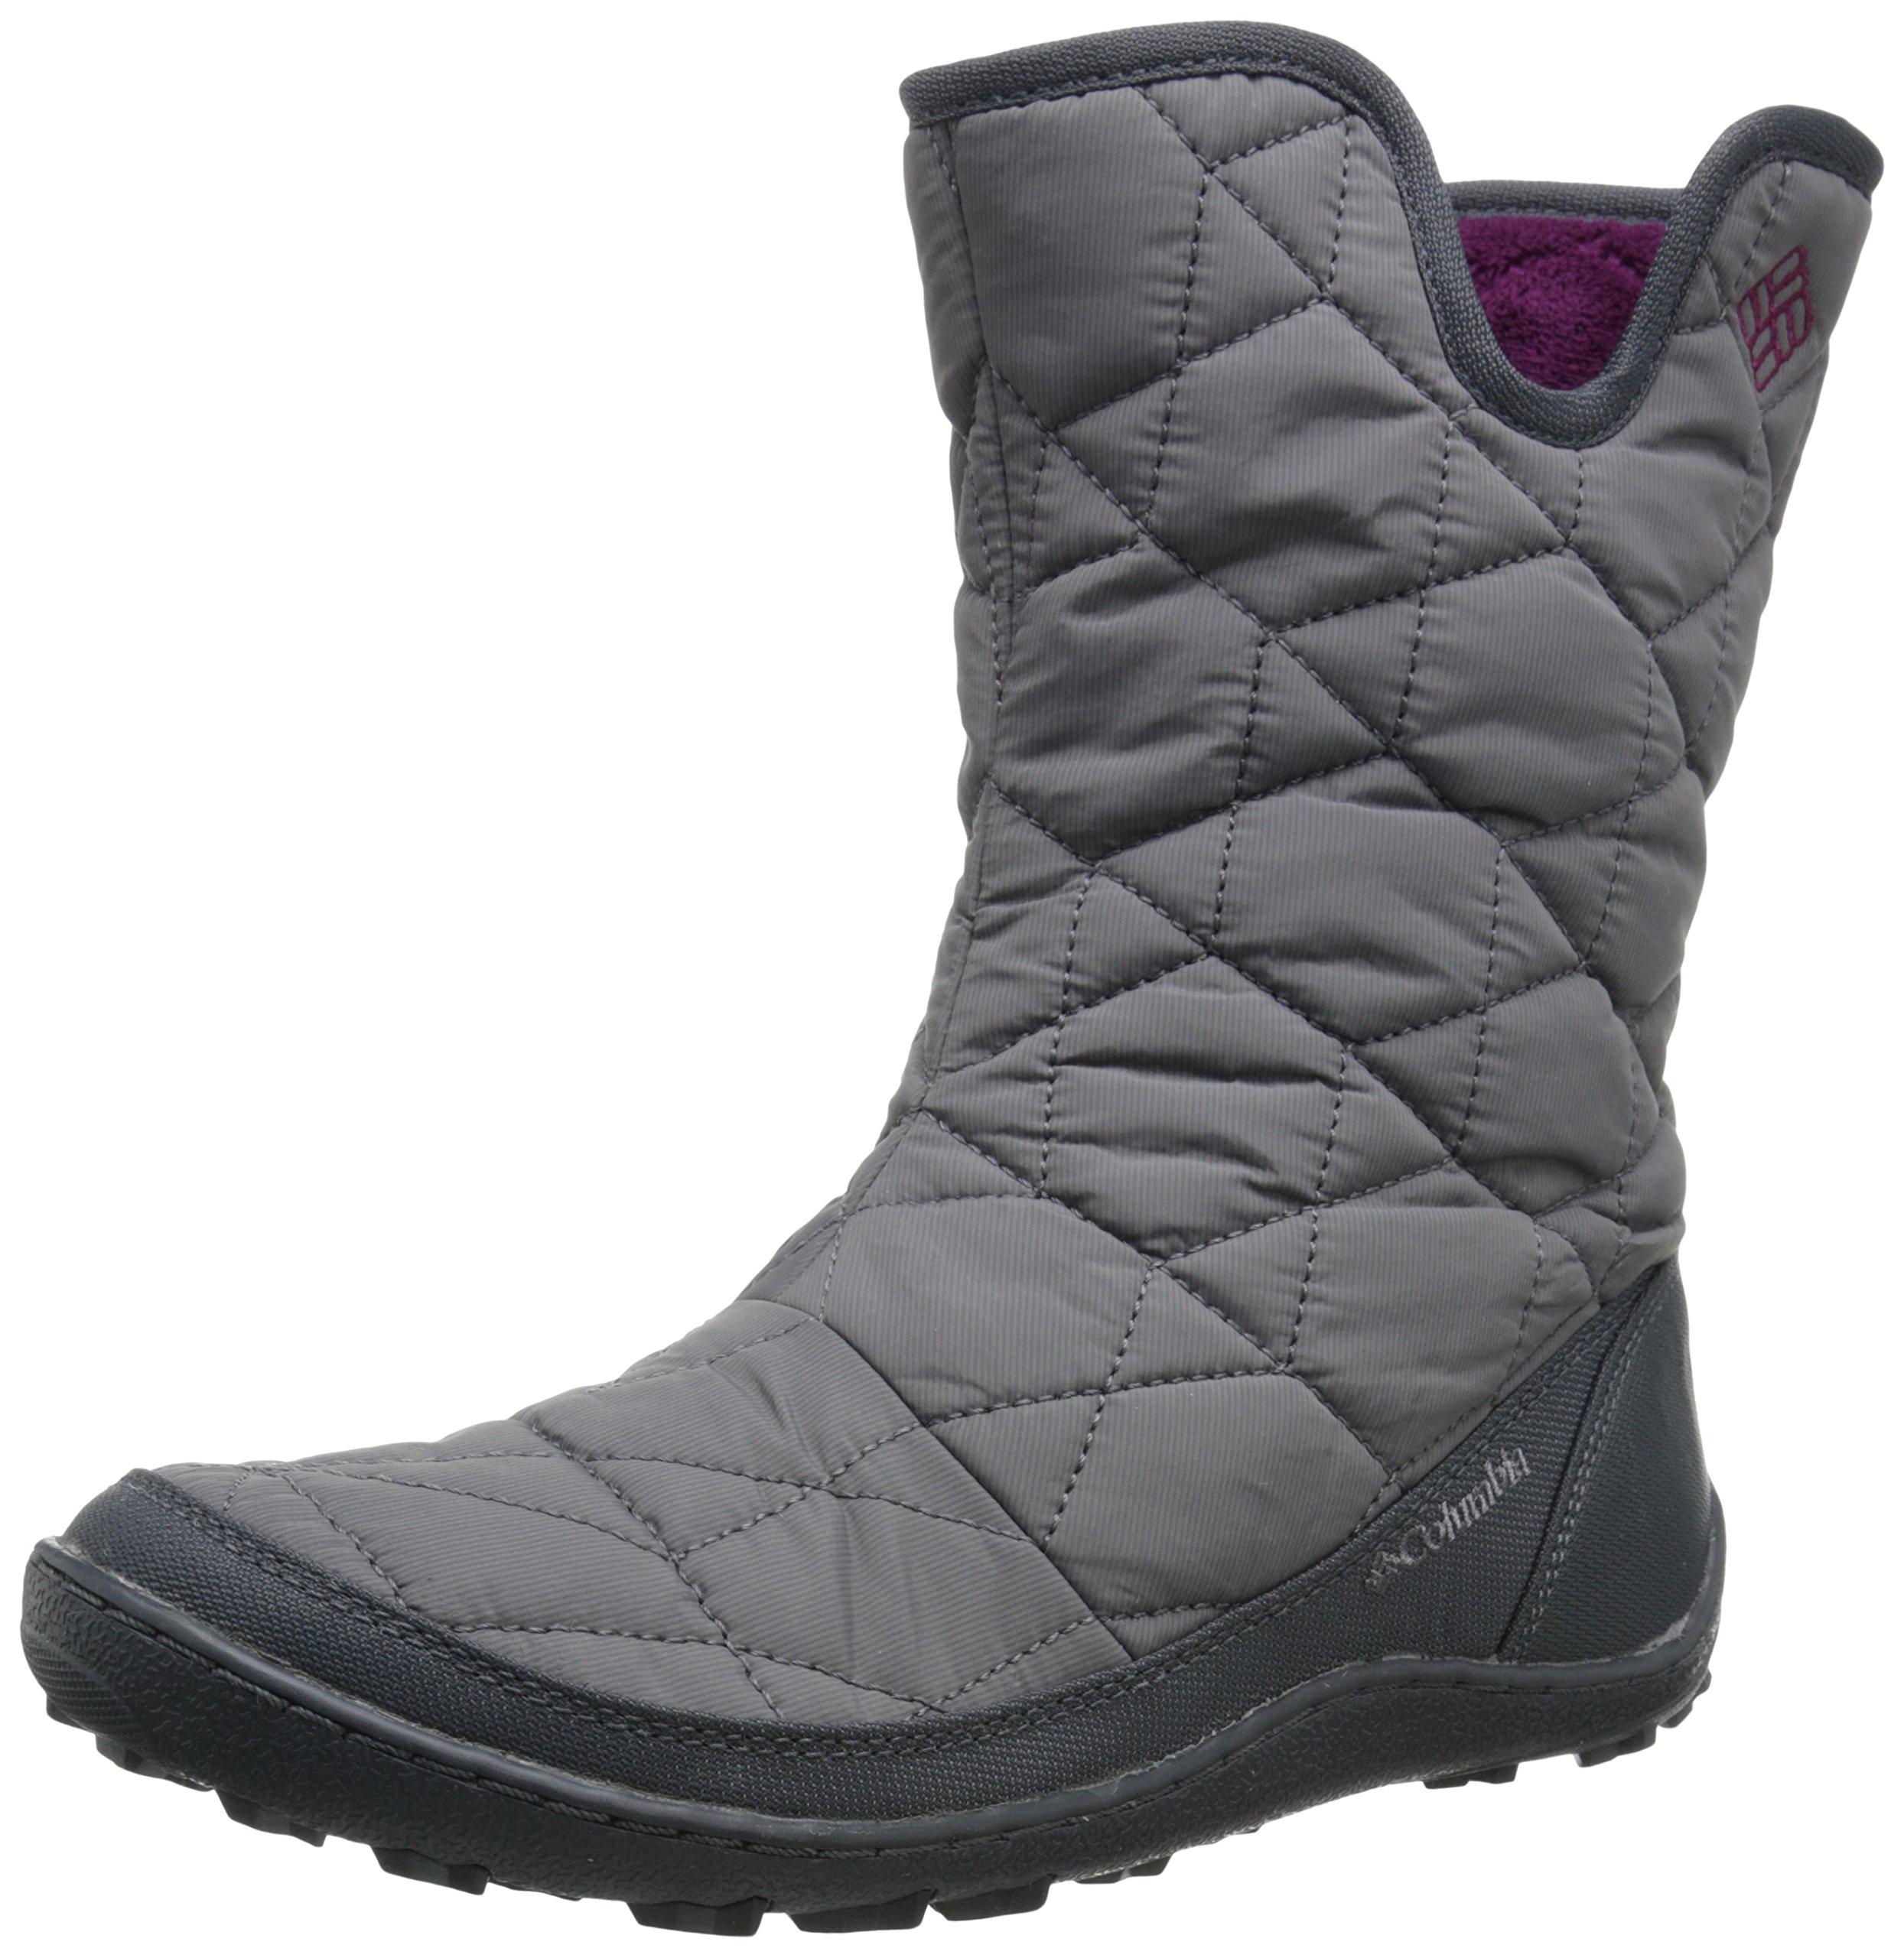 Columbia Women's Minx Slip Ii Omni-heat Snow Boot, Shale, Dark Raspberry, 10 B US